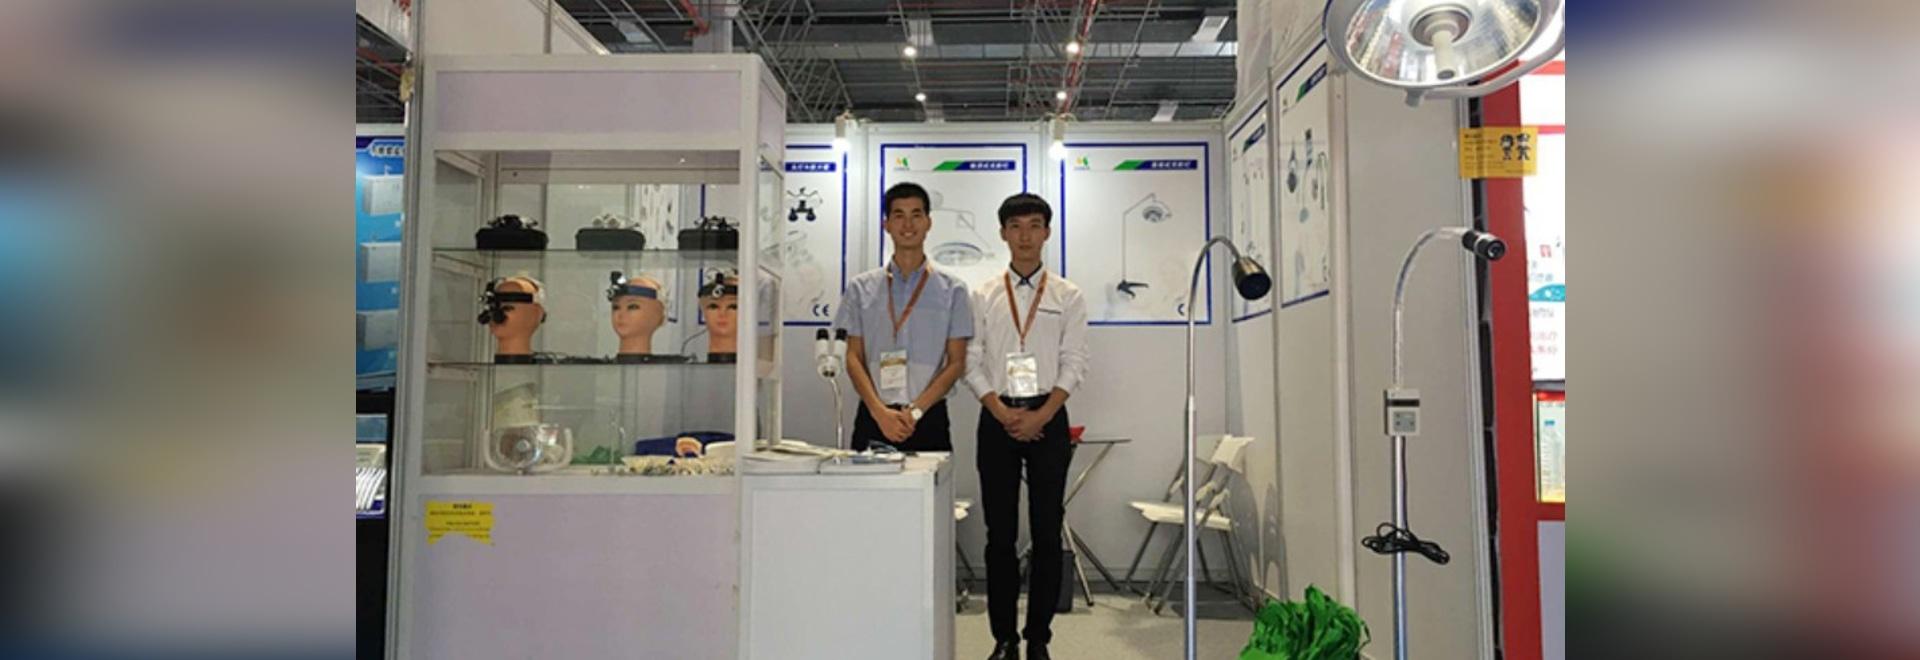 Salon international de l'équipement dentaire CDS de Shanghai